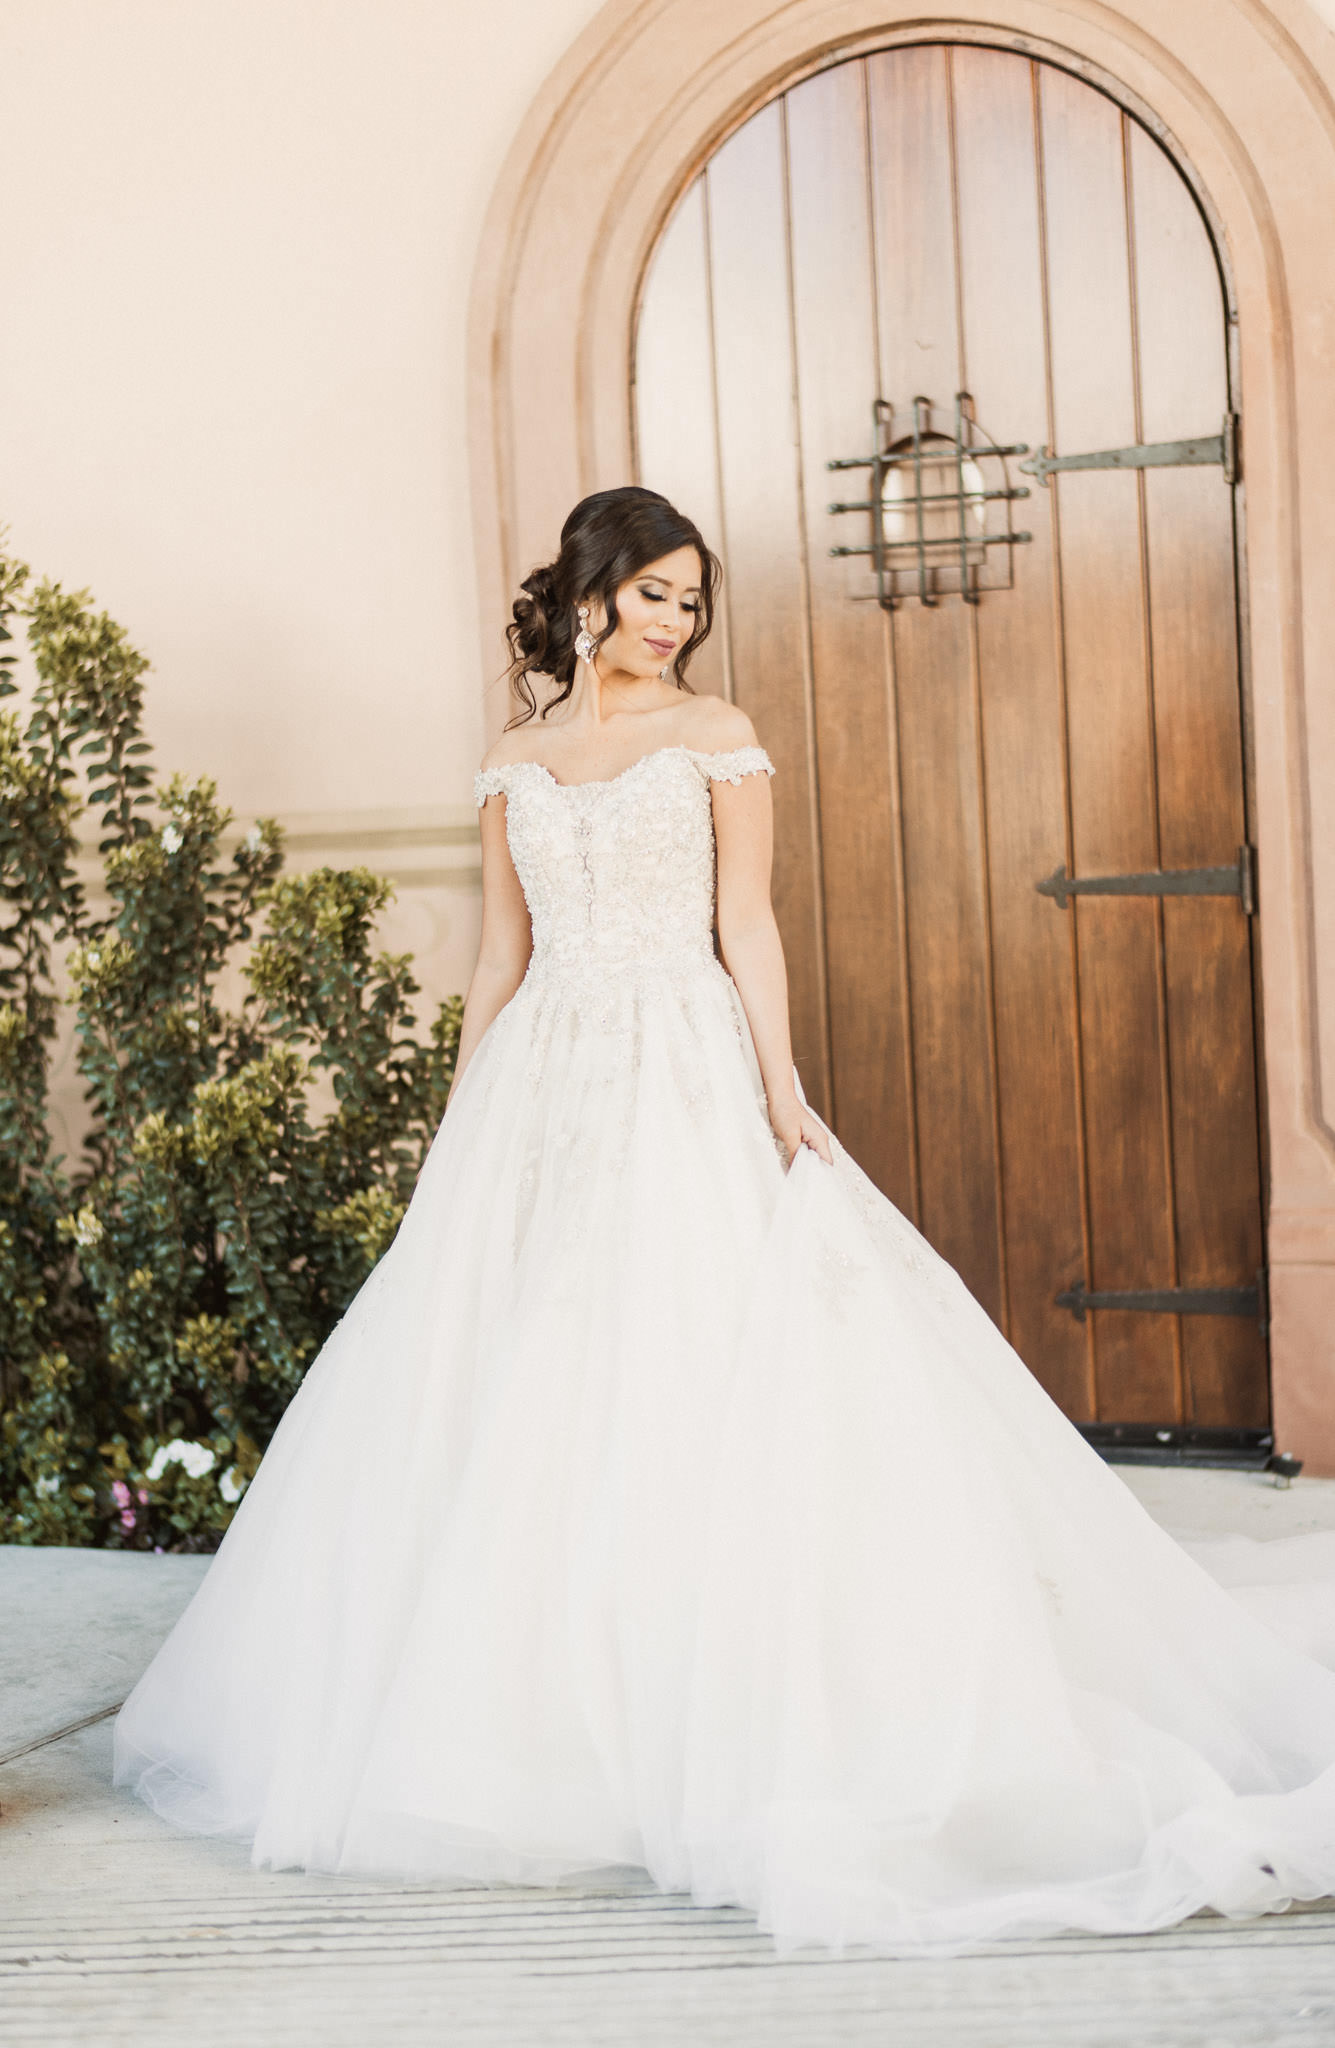 adriana-christian-wedding-re-sm-44.jpg